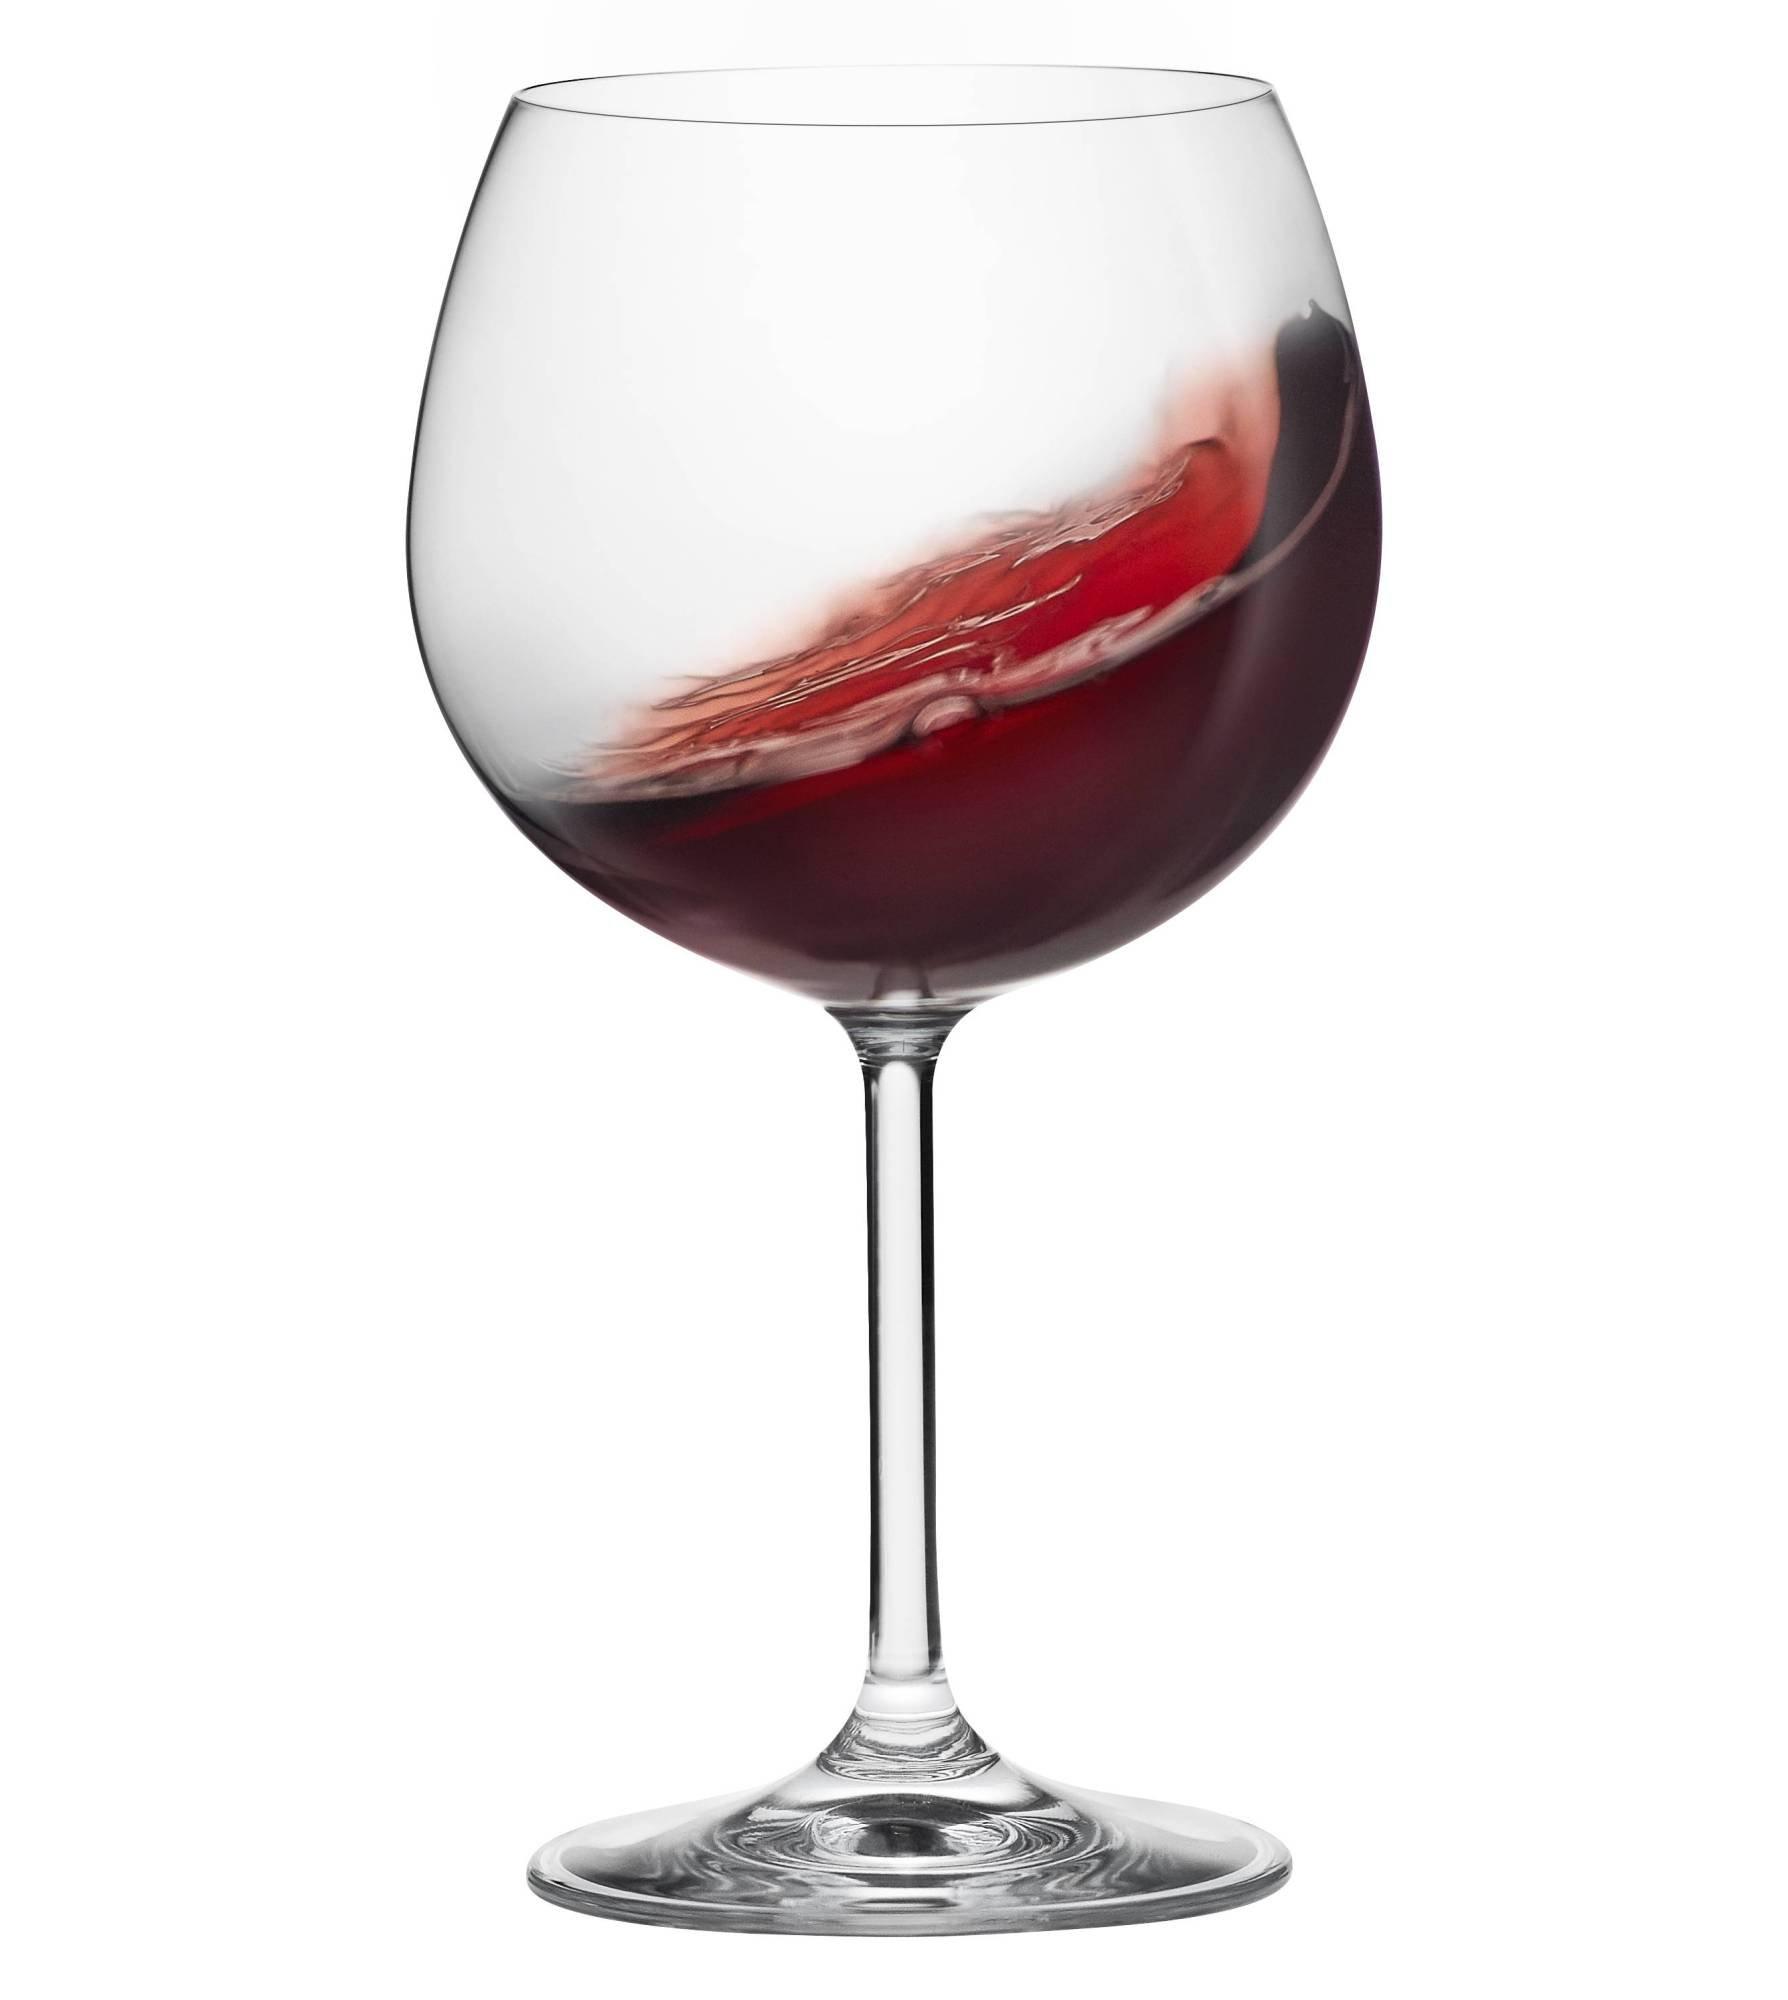 RONA GALA Wine Glass 16 oz, Burgundy, Set of 6